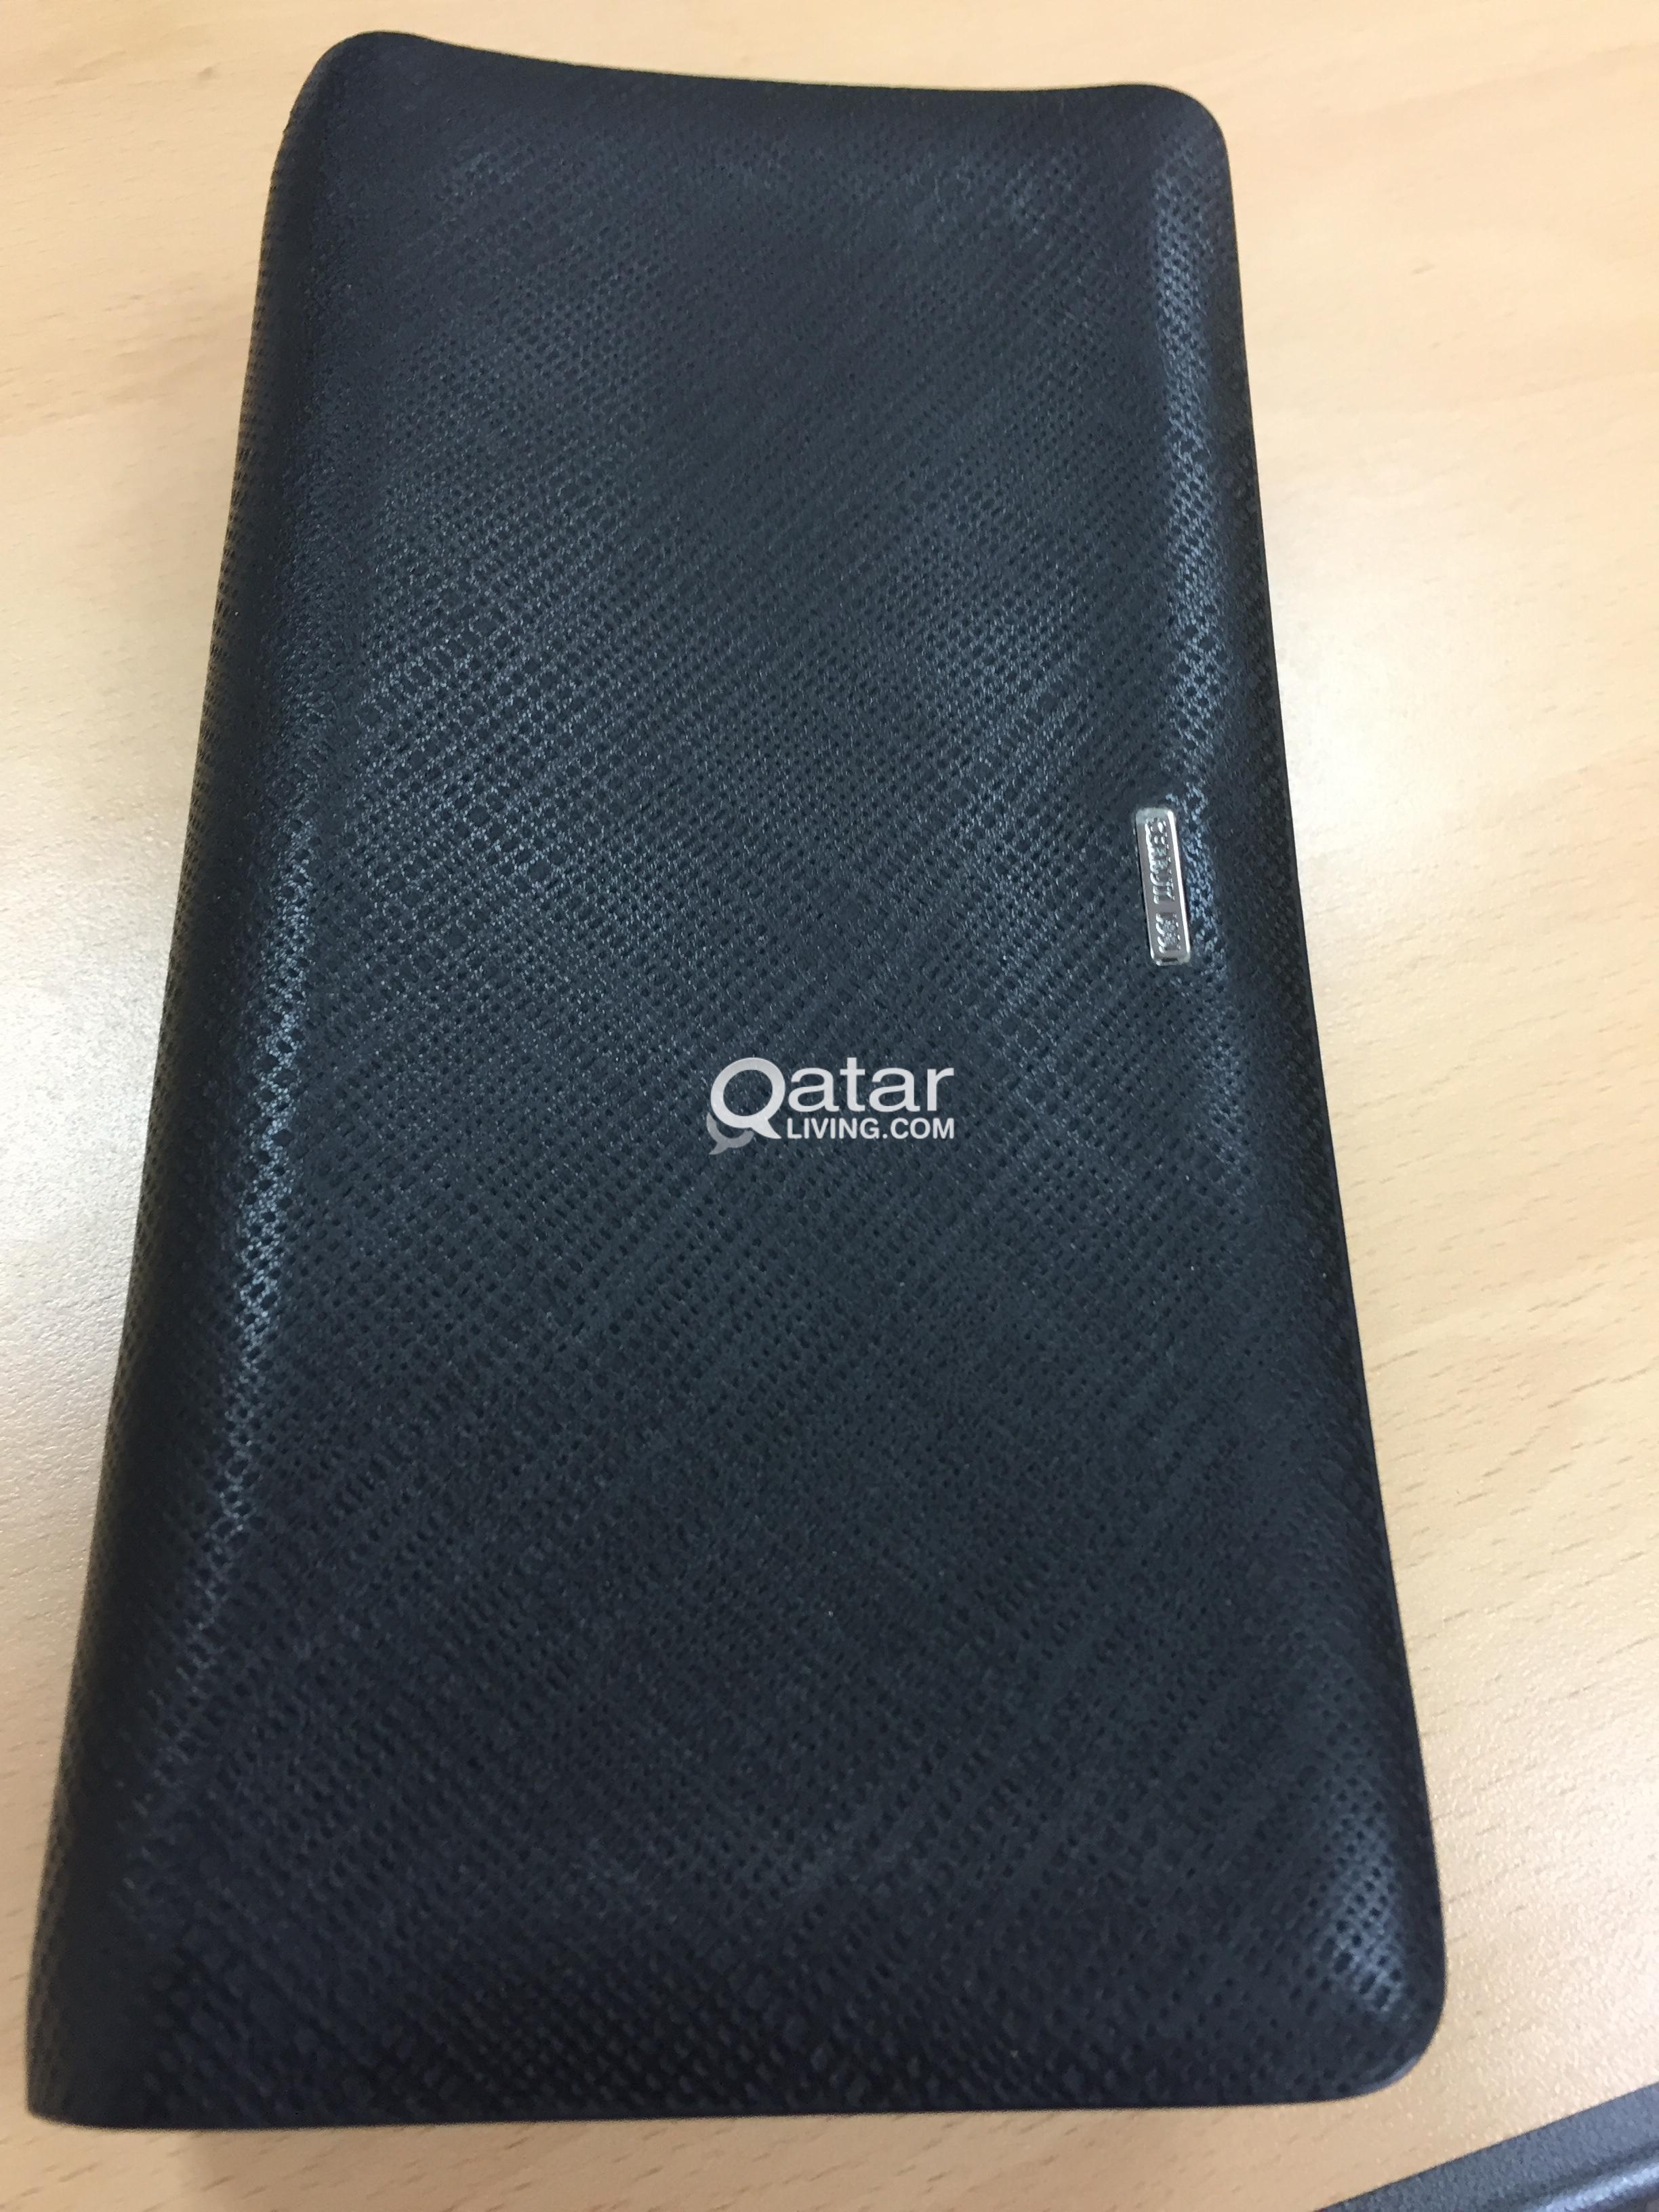 e6c5e4c391c Cerruti 1881 Multi-purpose Wallet   Qatar Living